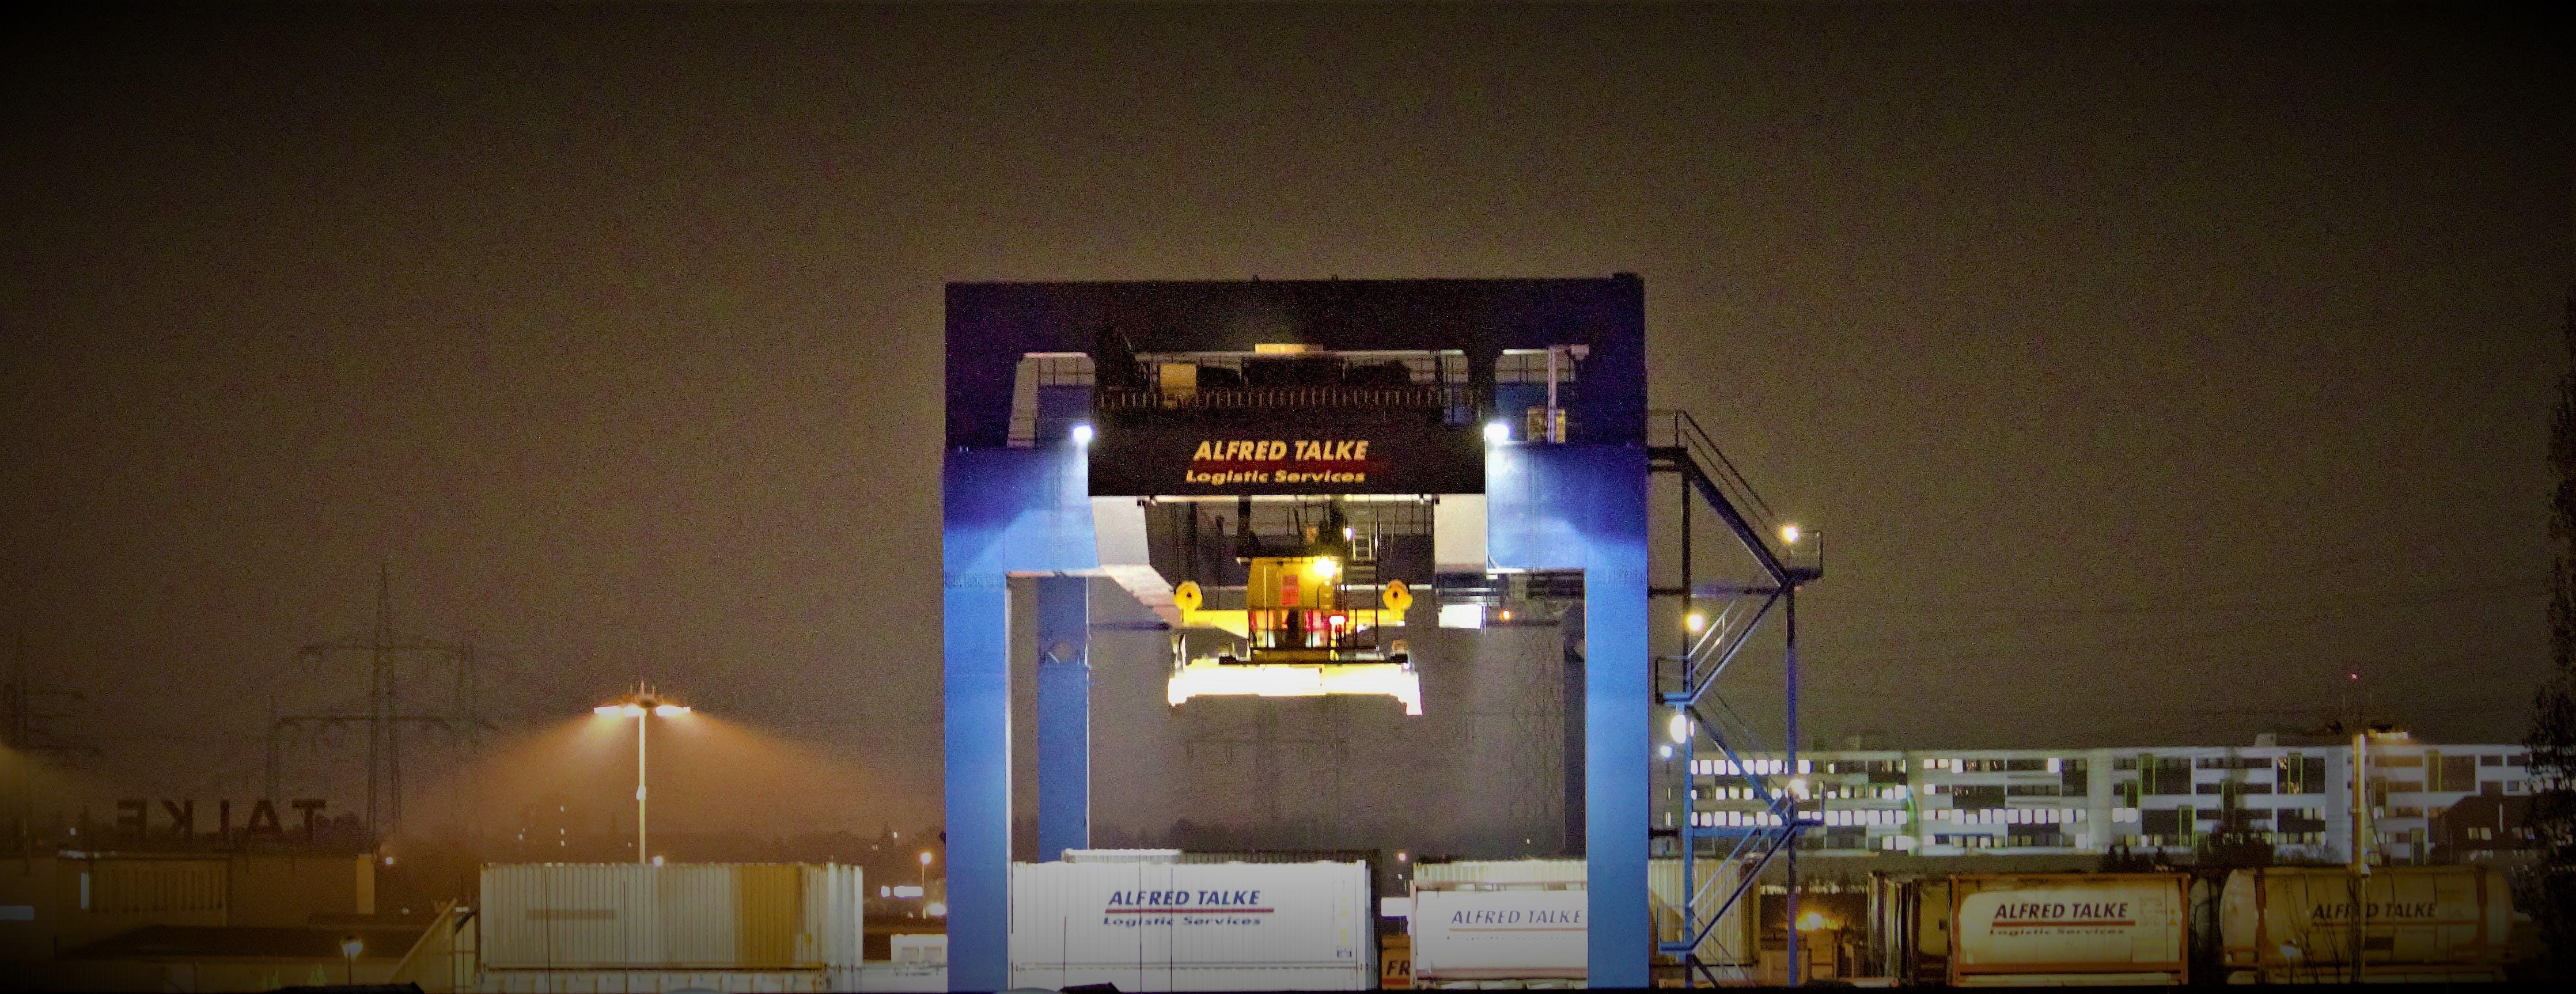 Free stock photo of lifting crane